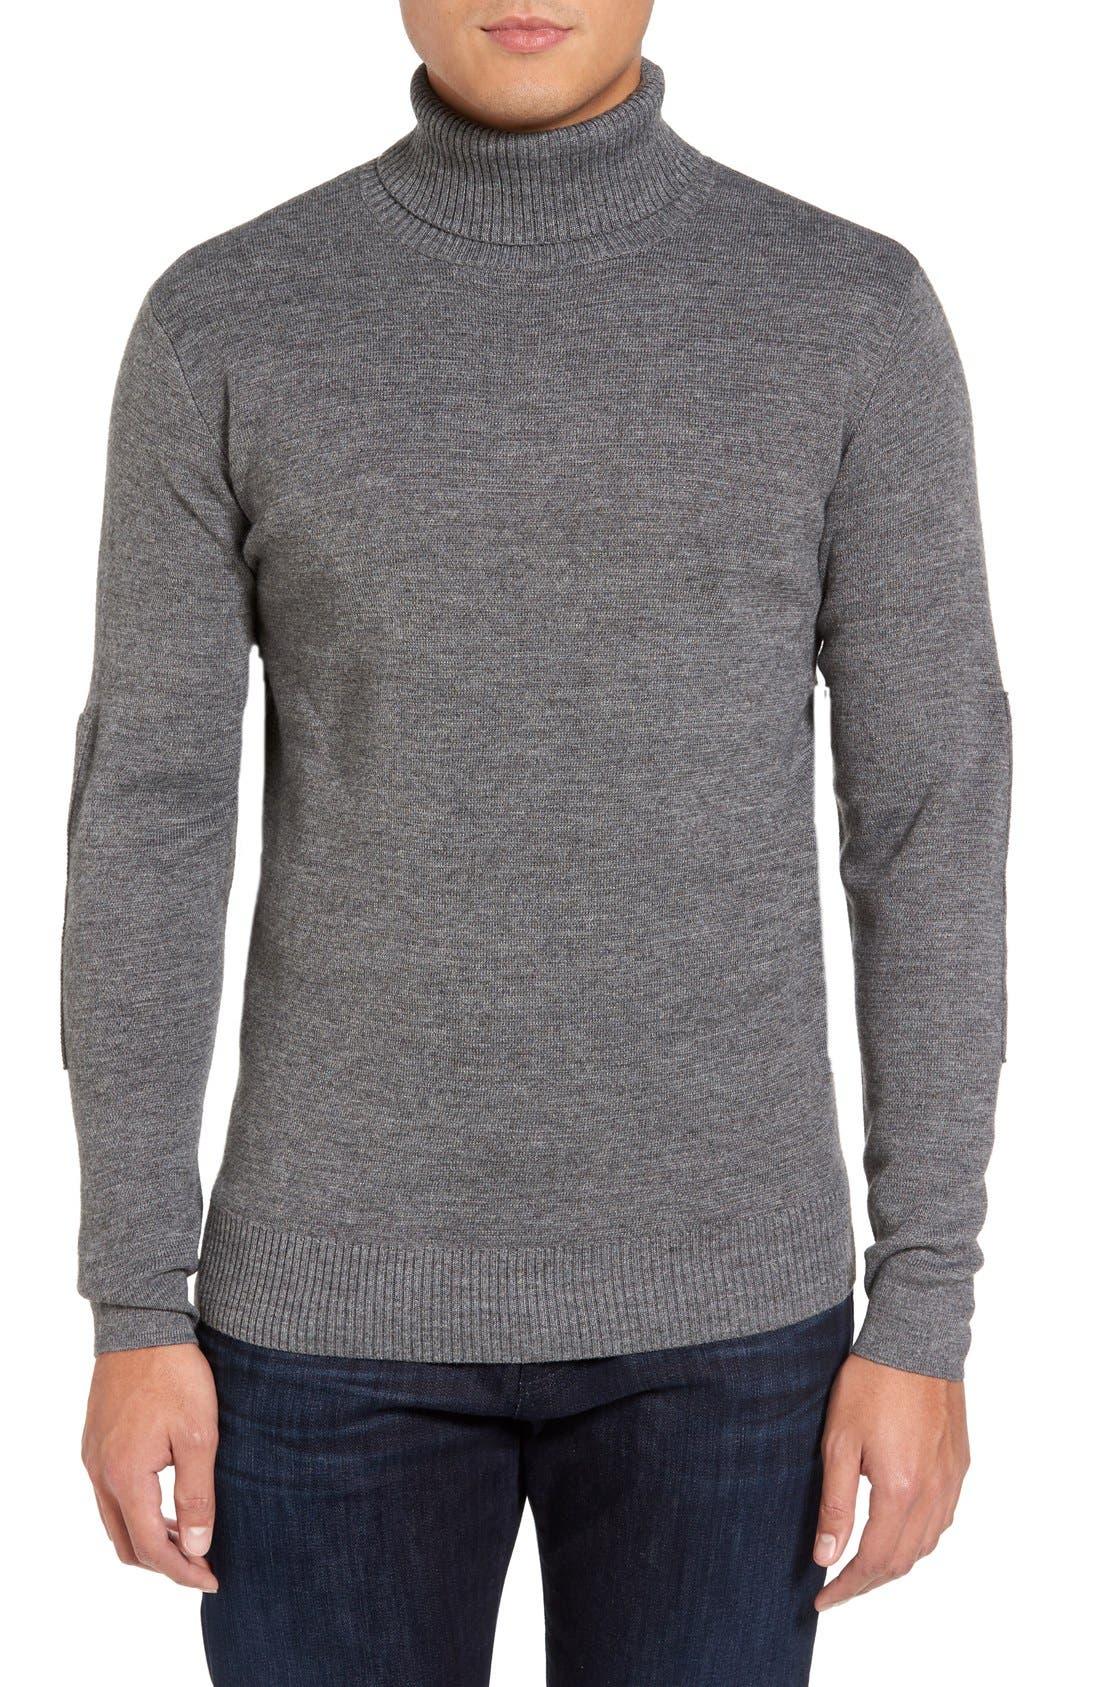 Main Image - Slate & Stone Merino Wool Blend Turtleneck Sweater